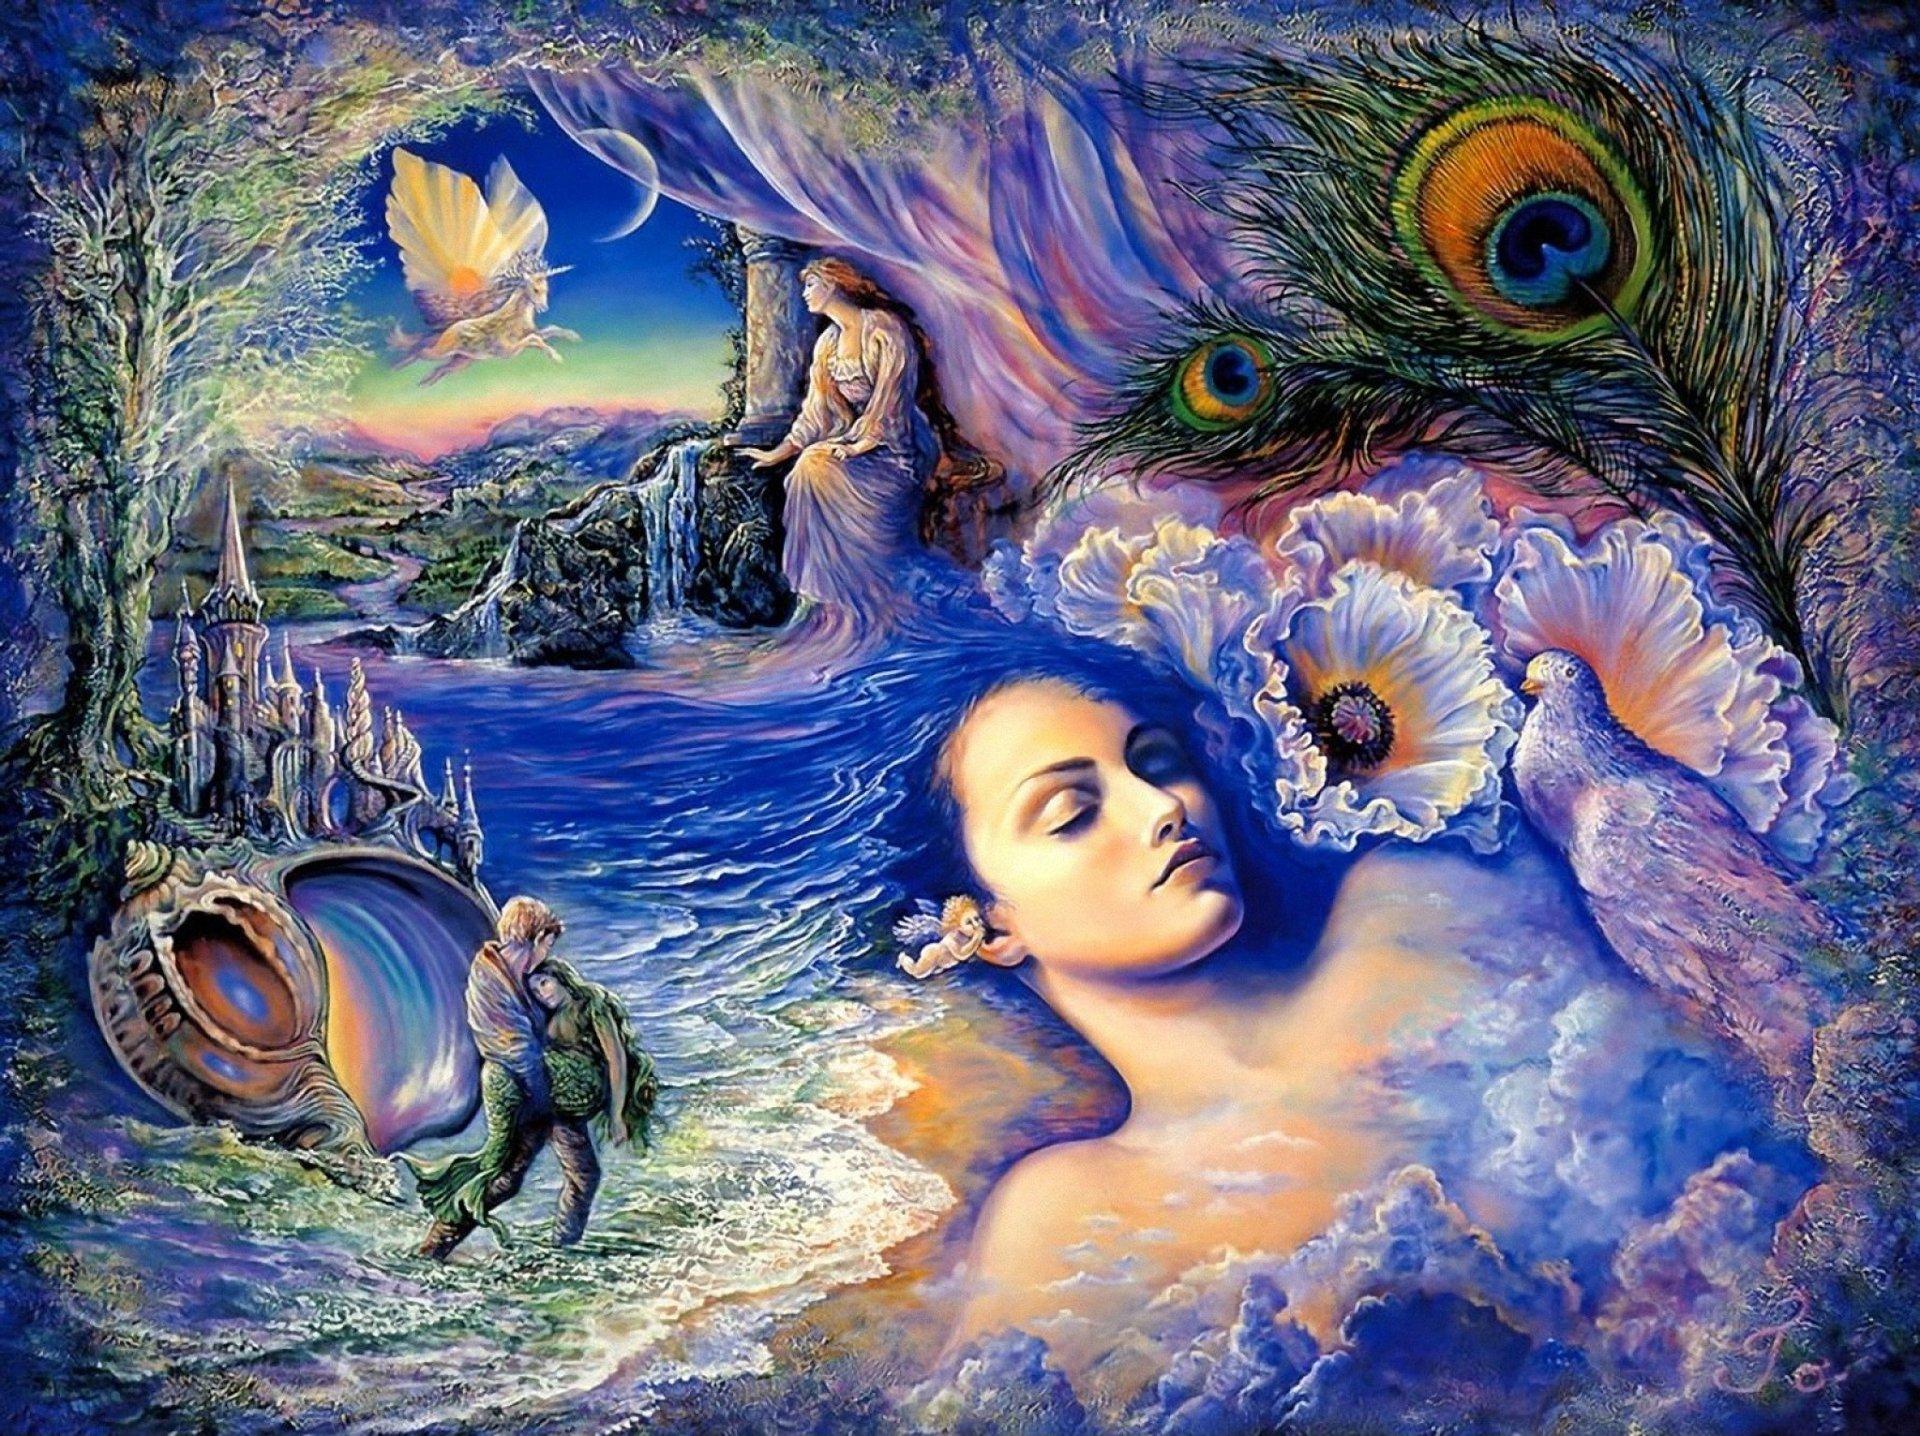 Artistic - Fantasy  Mermaid Artistic Woman Girl Sleeping Wallpaper